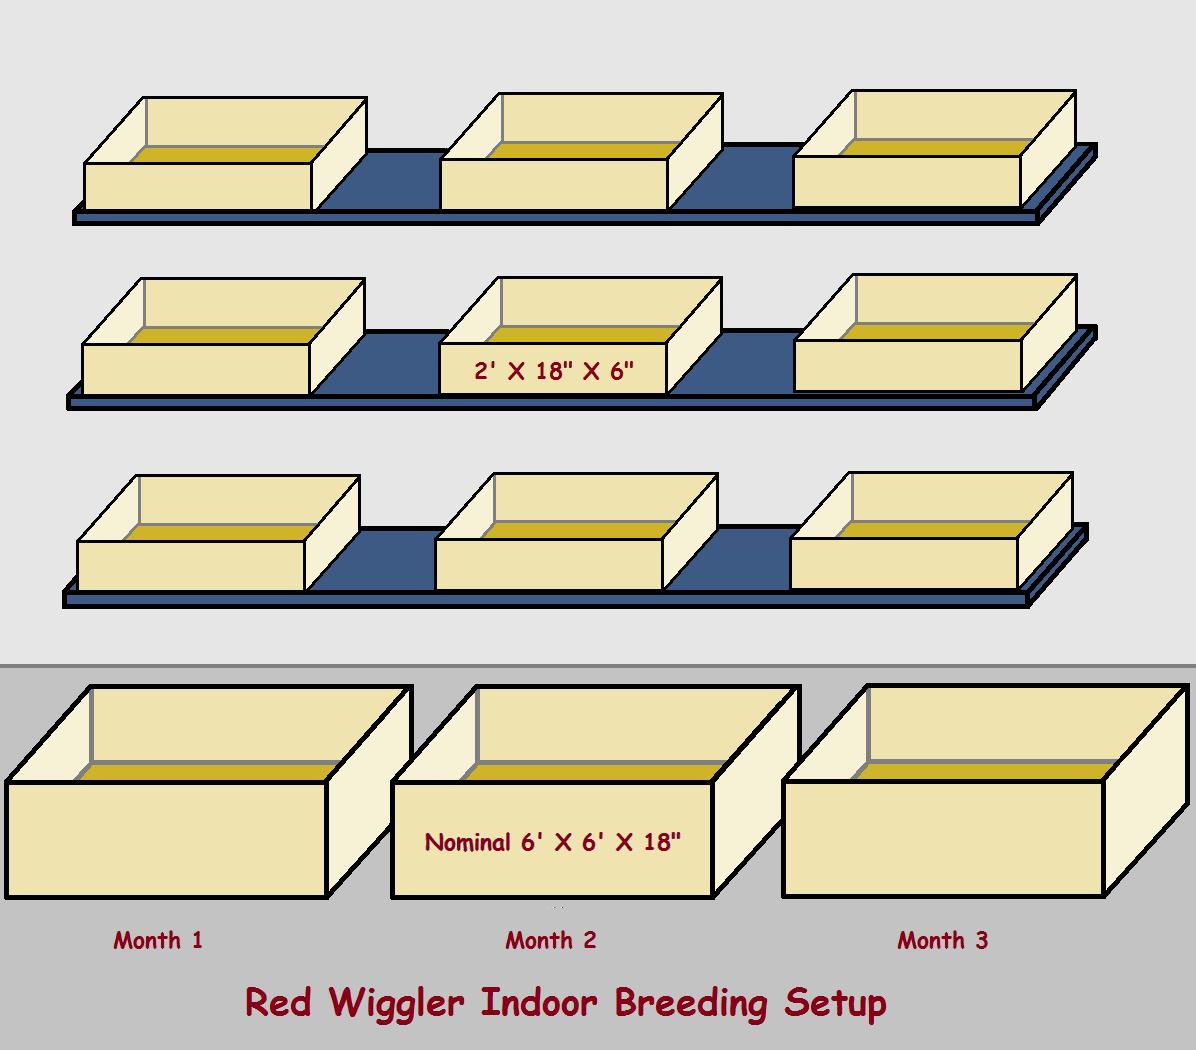 red wiggler